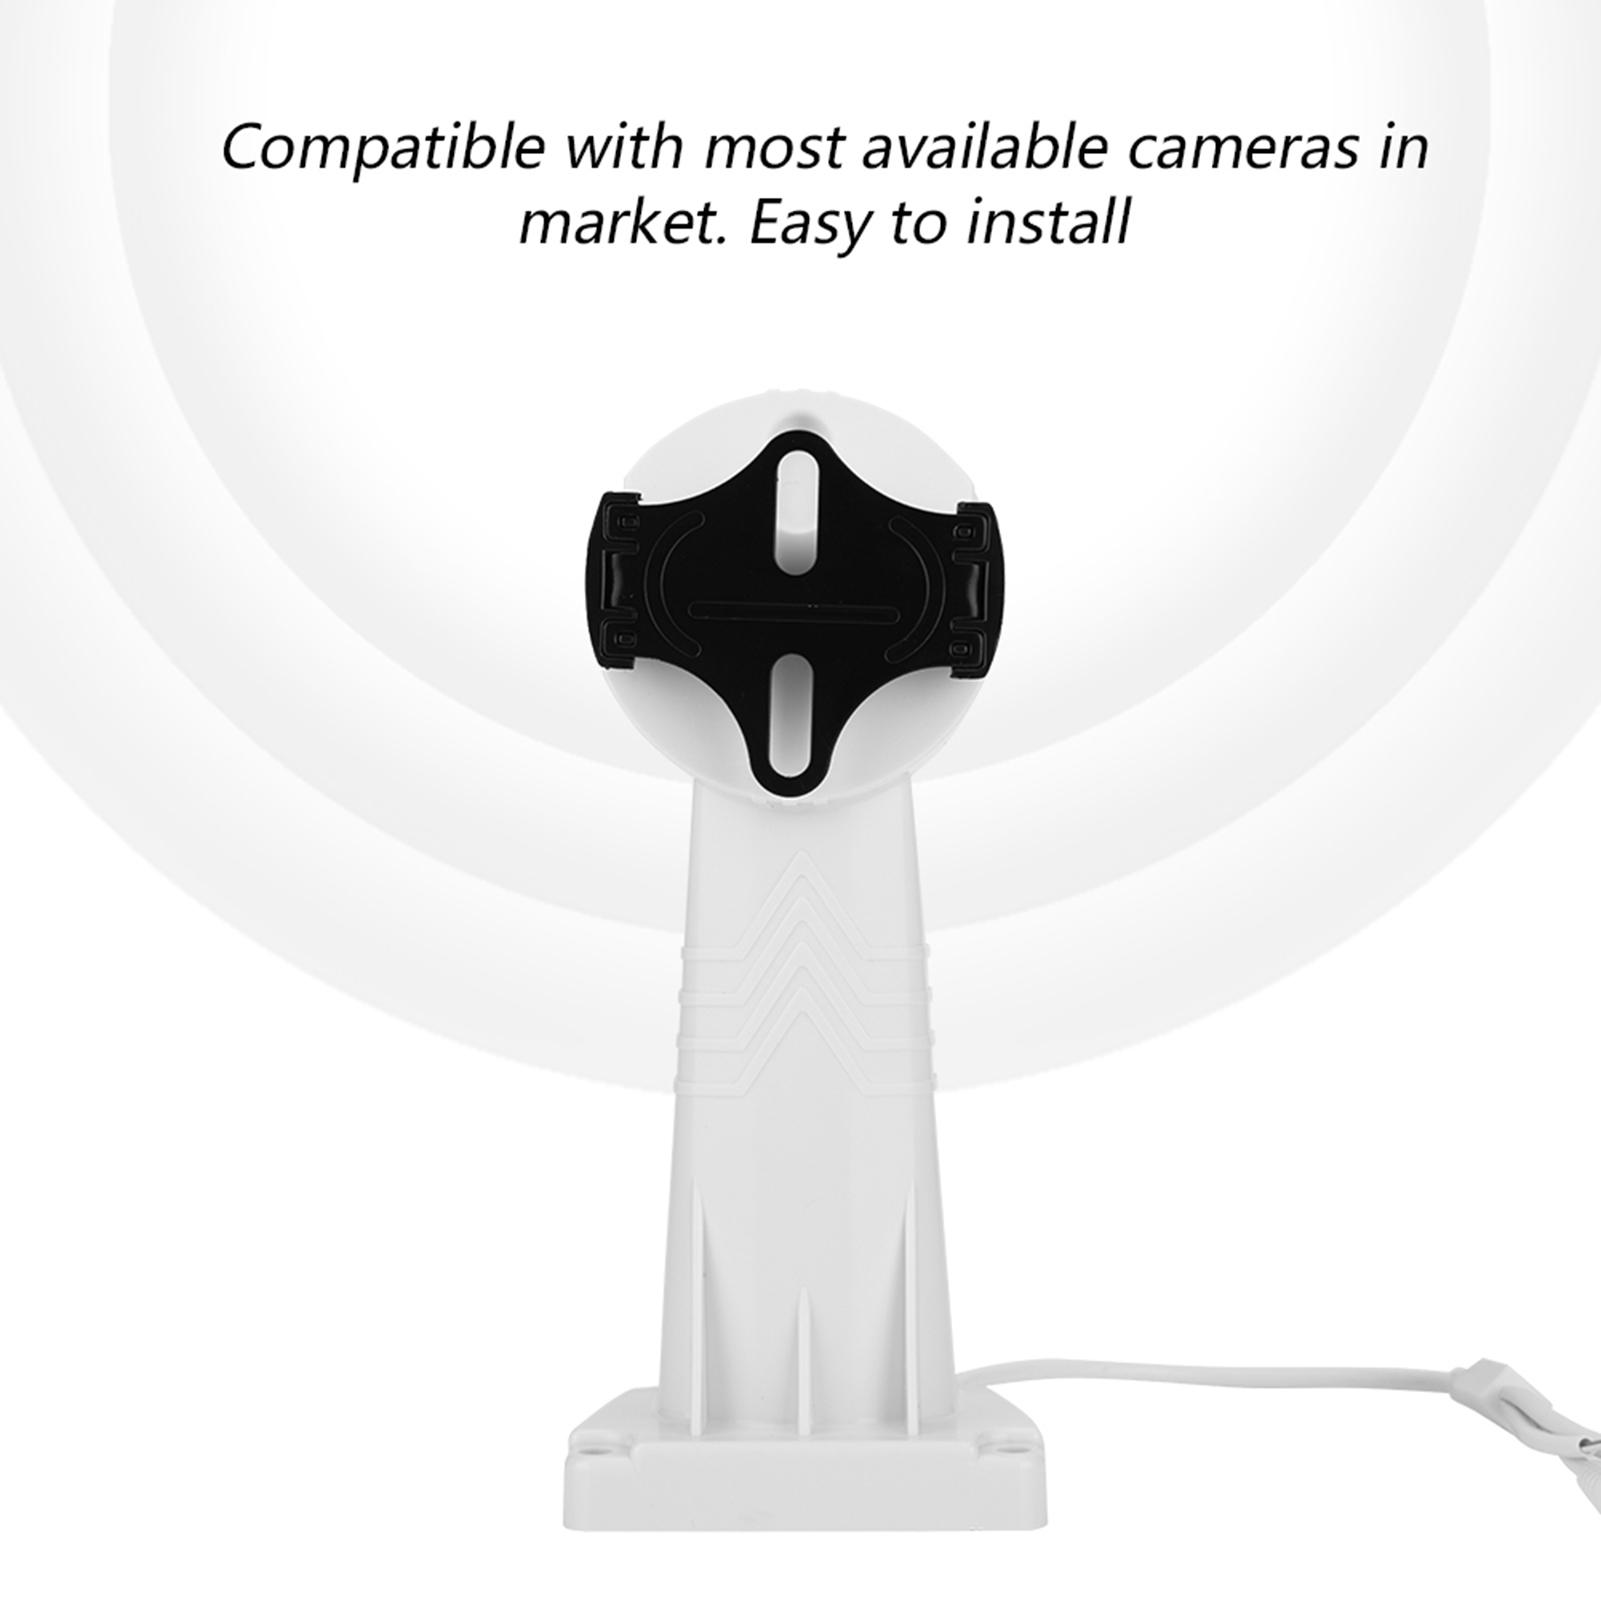 CCTV-Cameras-Rotate-Pan-Tilt-PTZ-Bracket-Electrical-Mount-Stand-Support-RS485-ZZ miniature 15